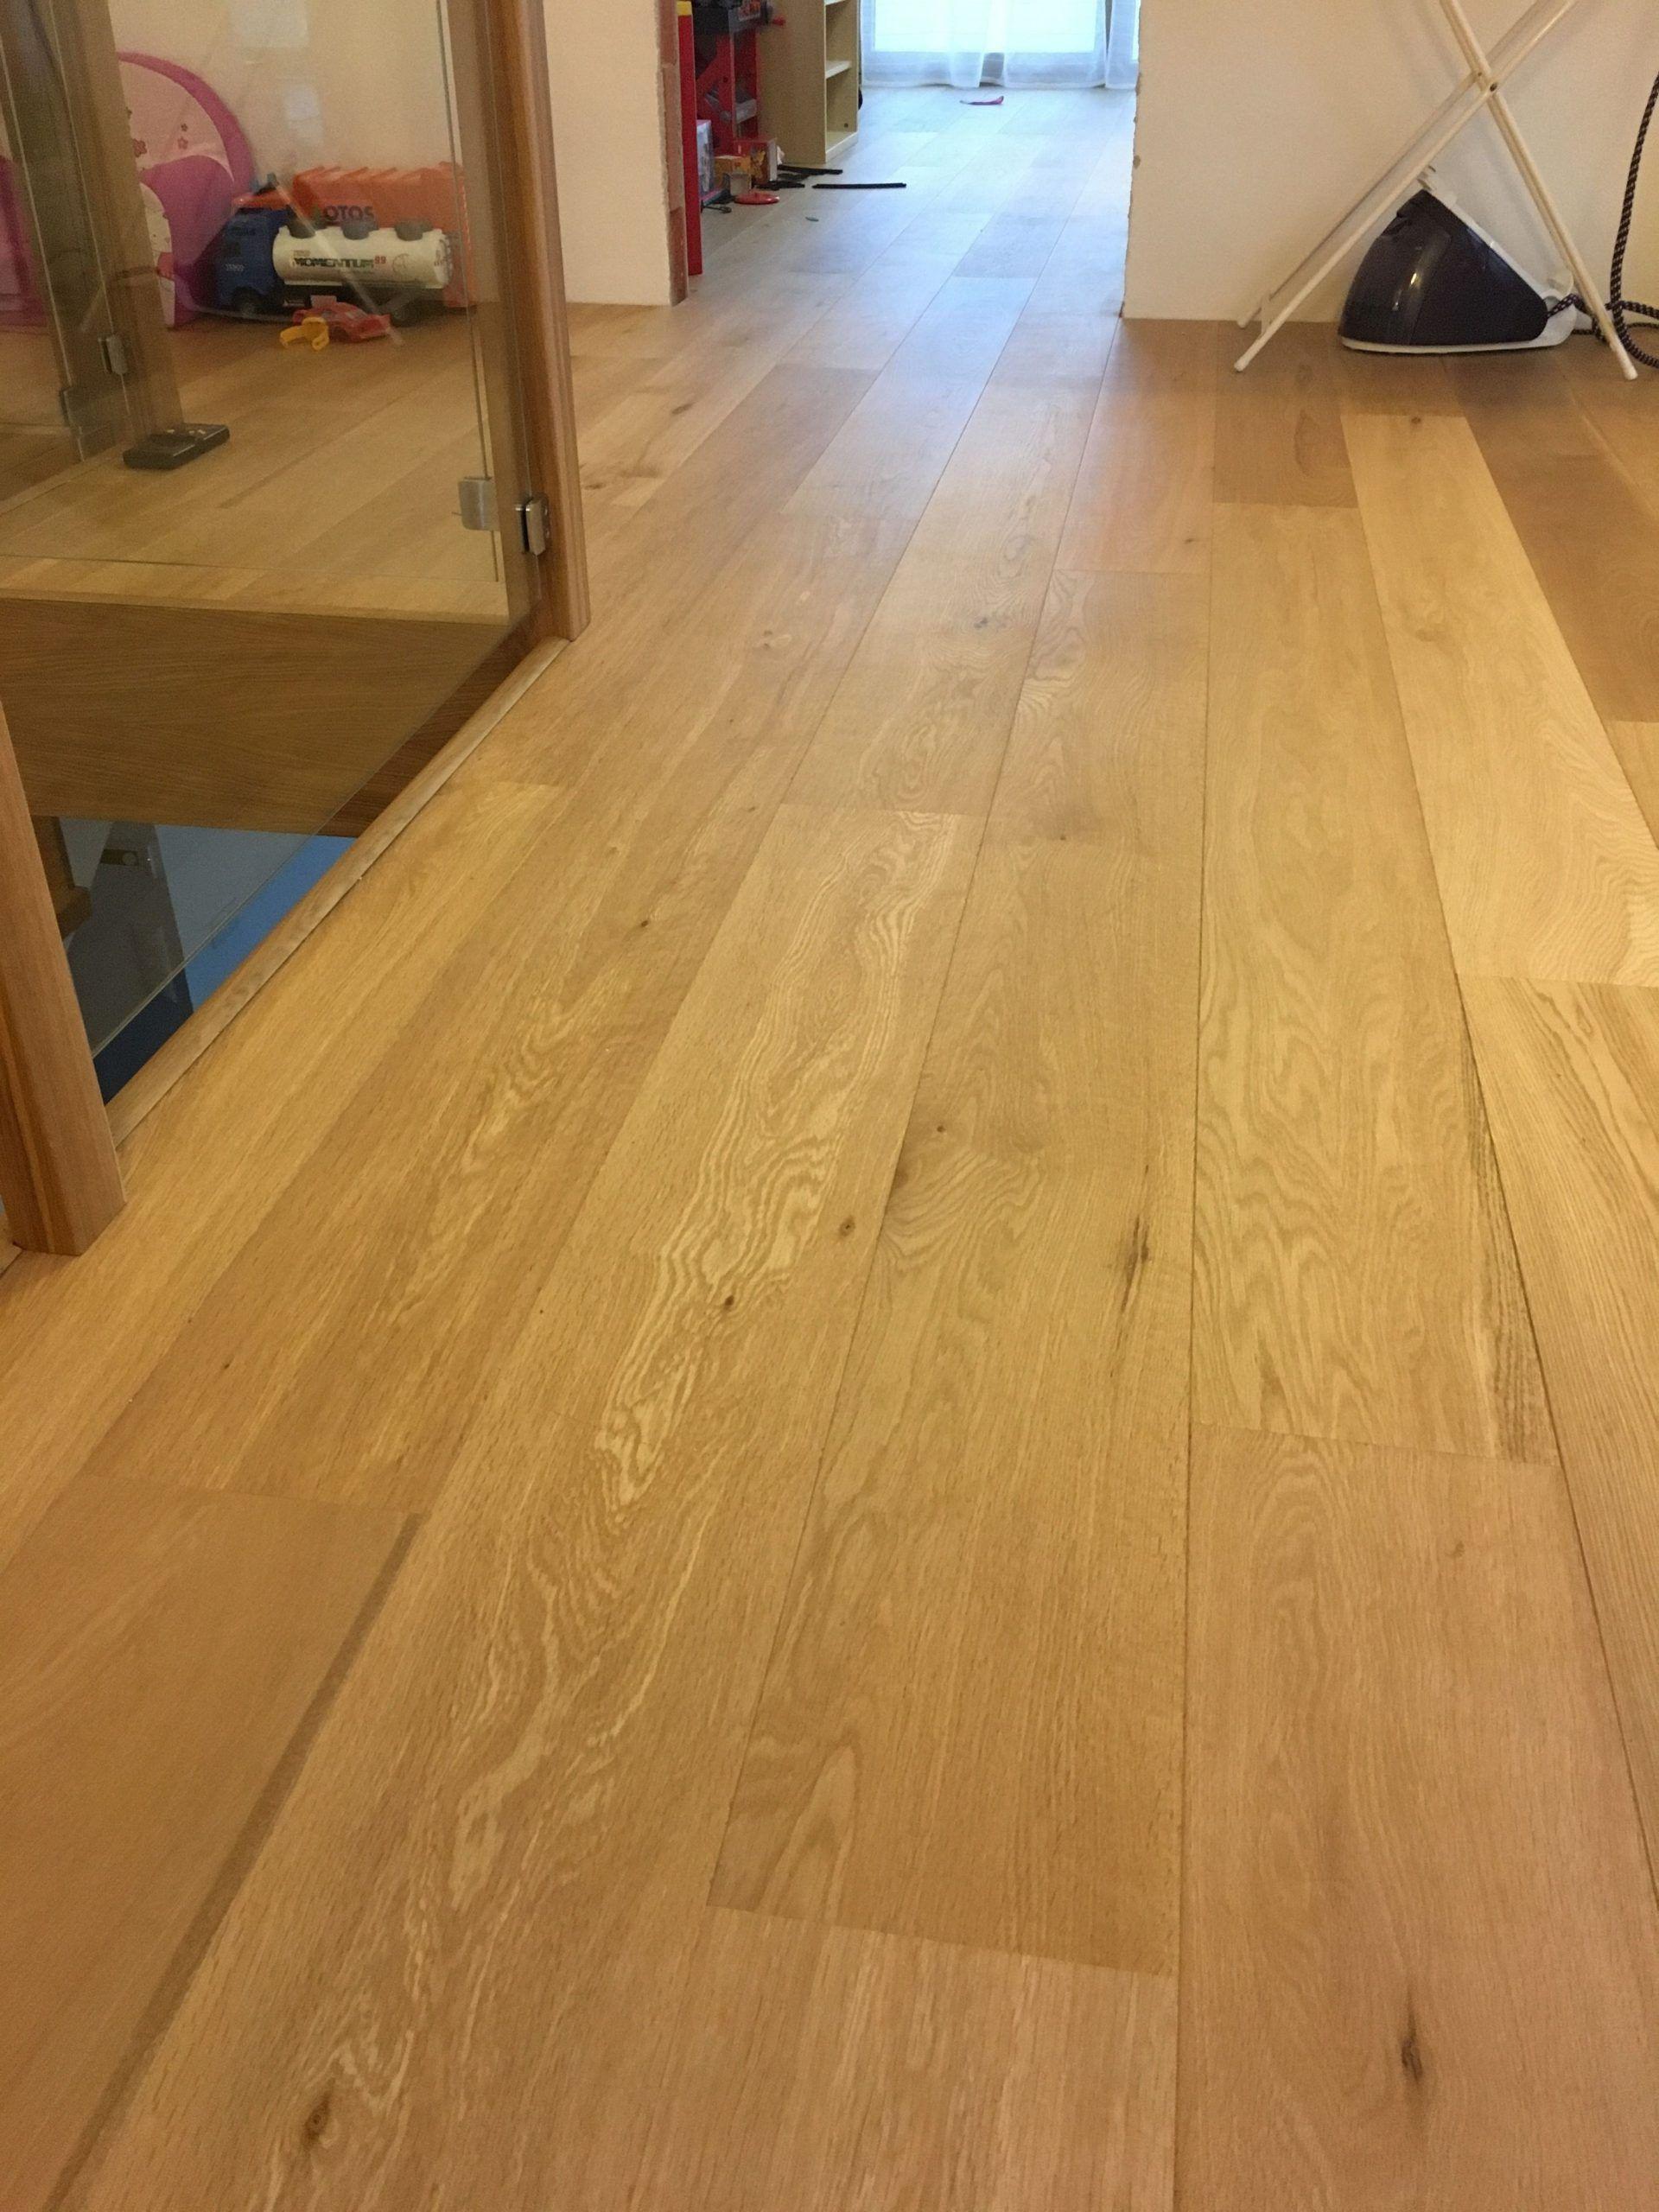 11 Unique Used Wooden Flooring Transition Between Tile And Hardwood Floor Of Til In 2020 Installing Vinyl Plank Flooring Vinyl Plank Flooring Laminate Hardwood Flooring